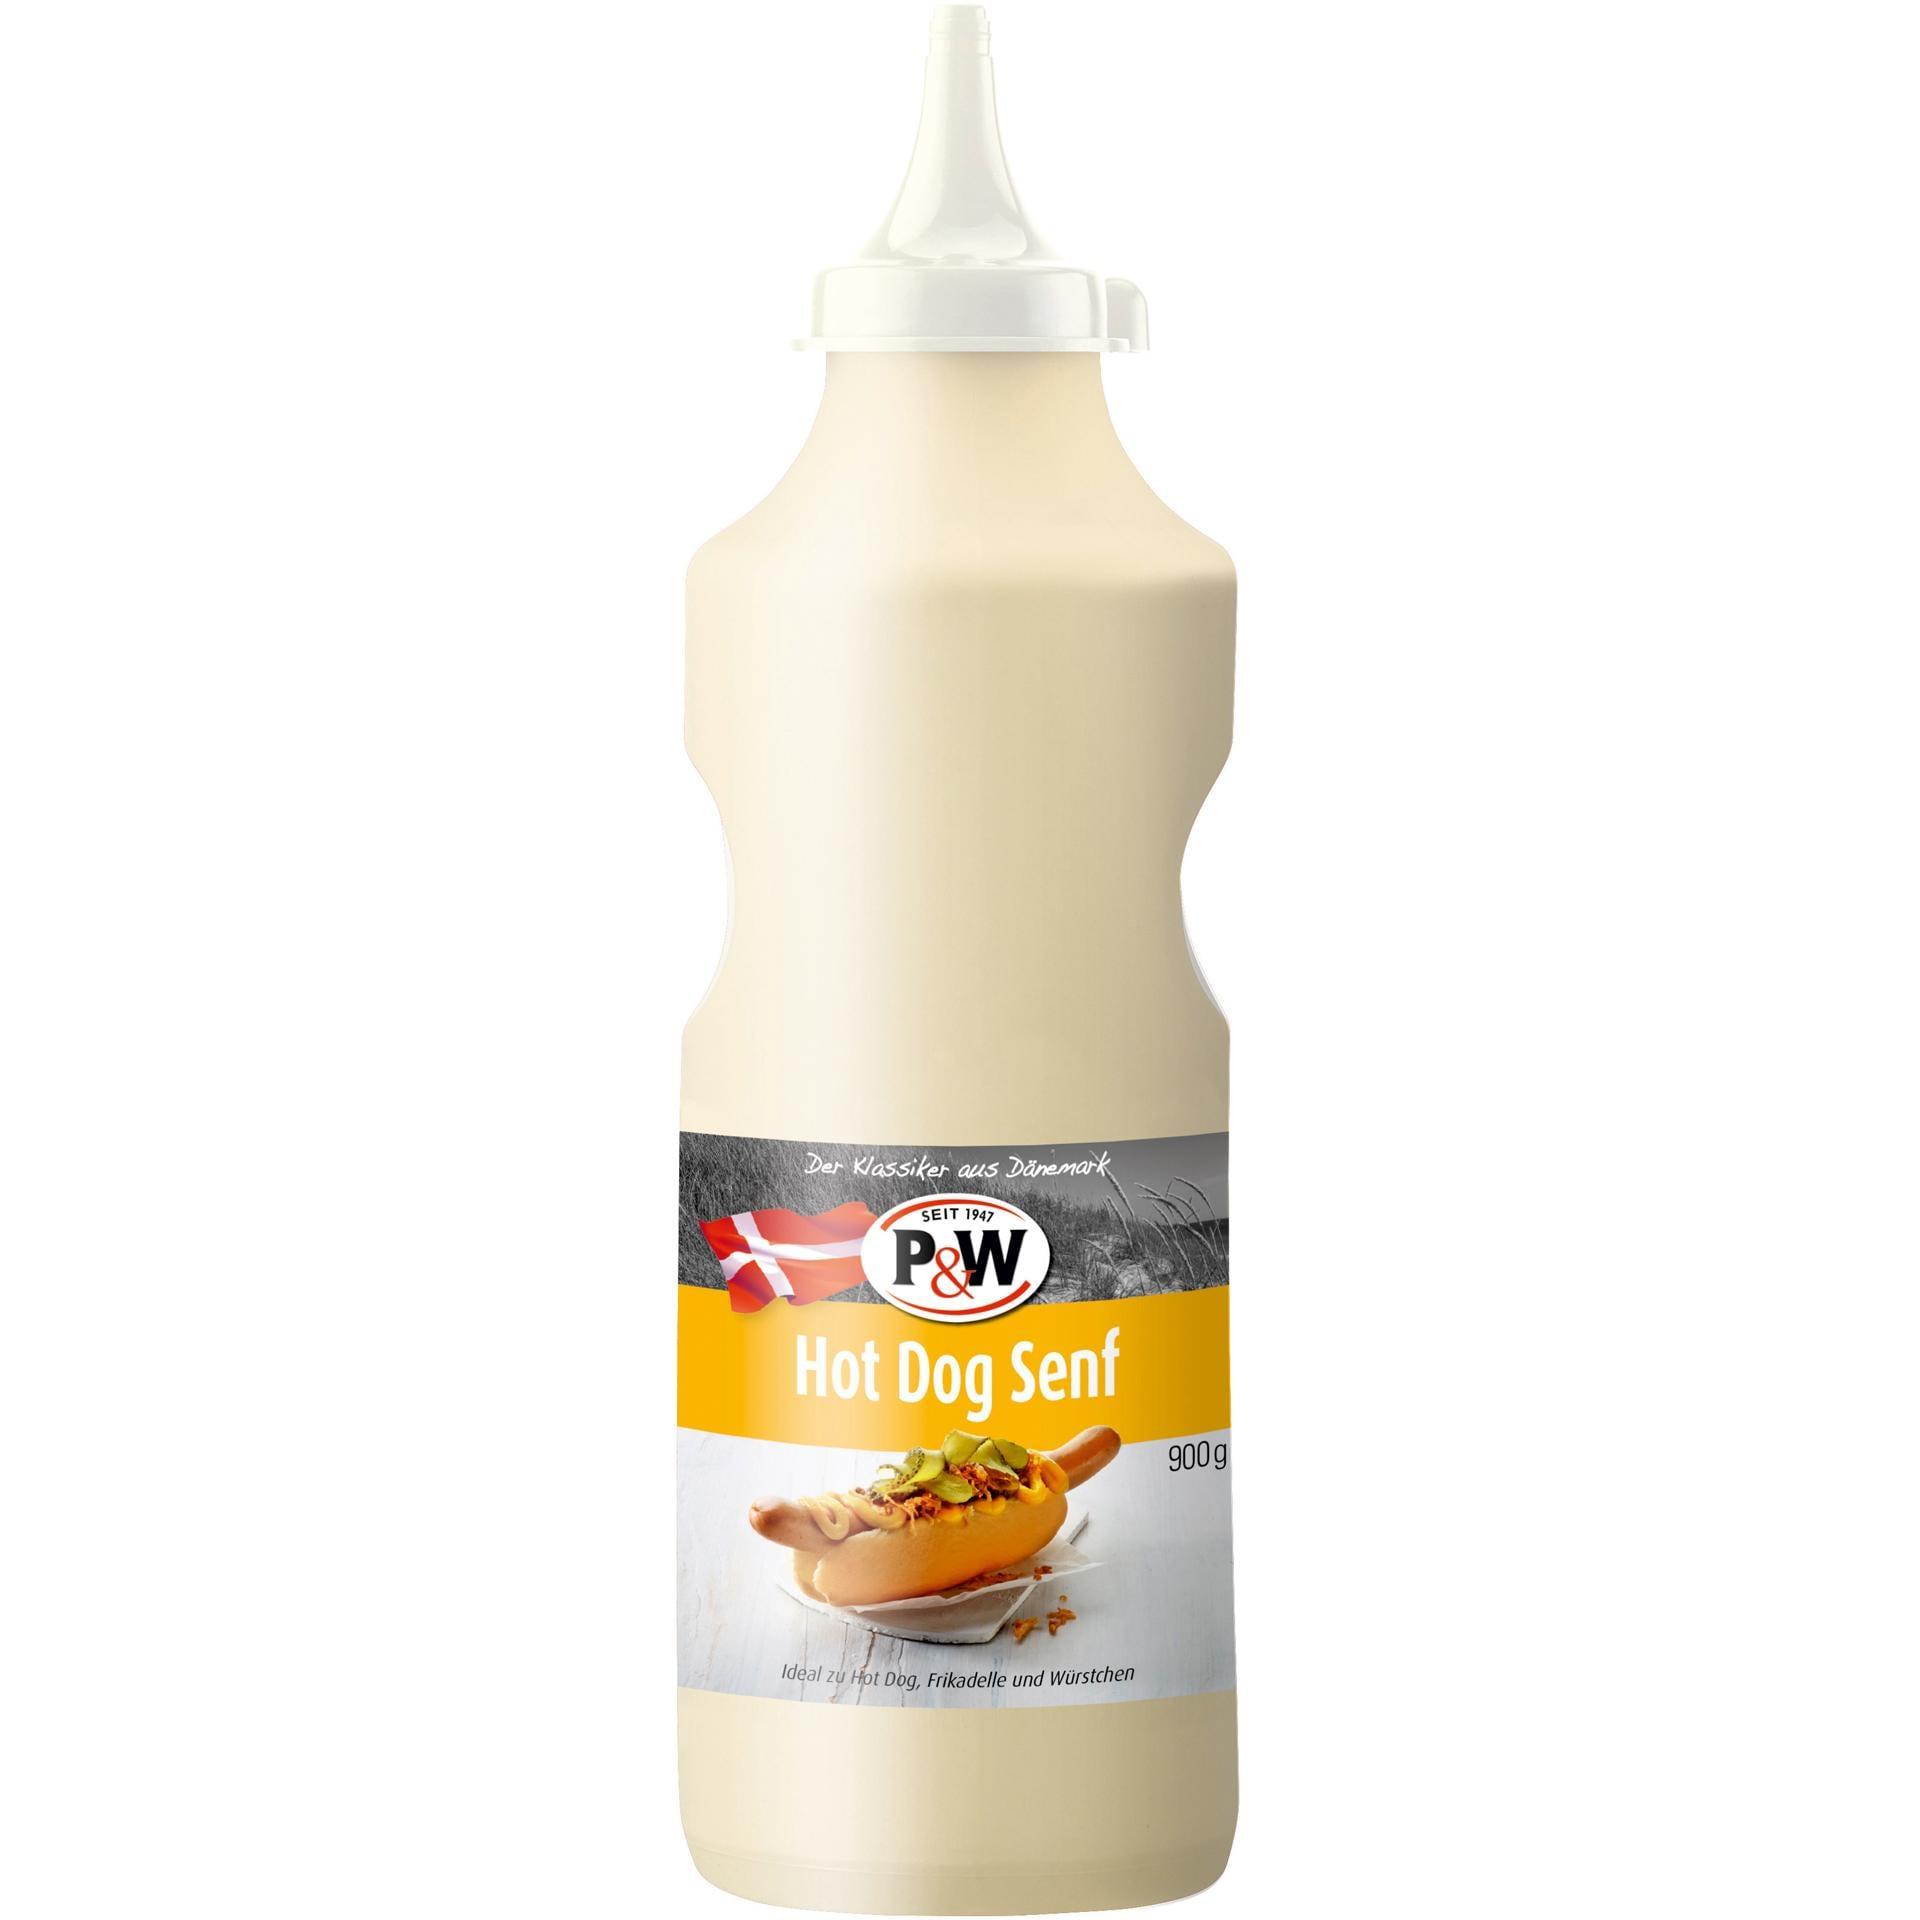 P&W - Hot Dog Senf dänisches Senfdressing Squeezeflasche - 900g